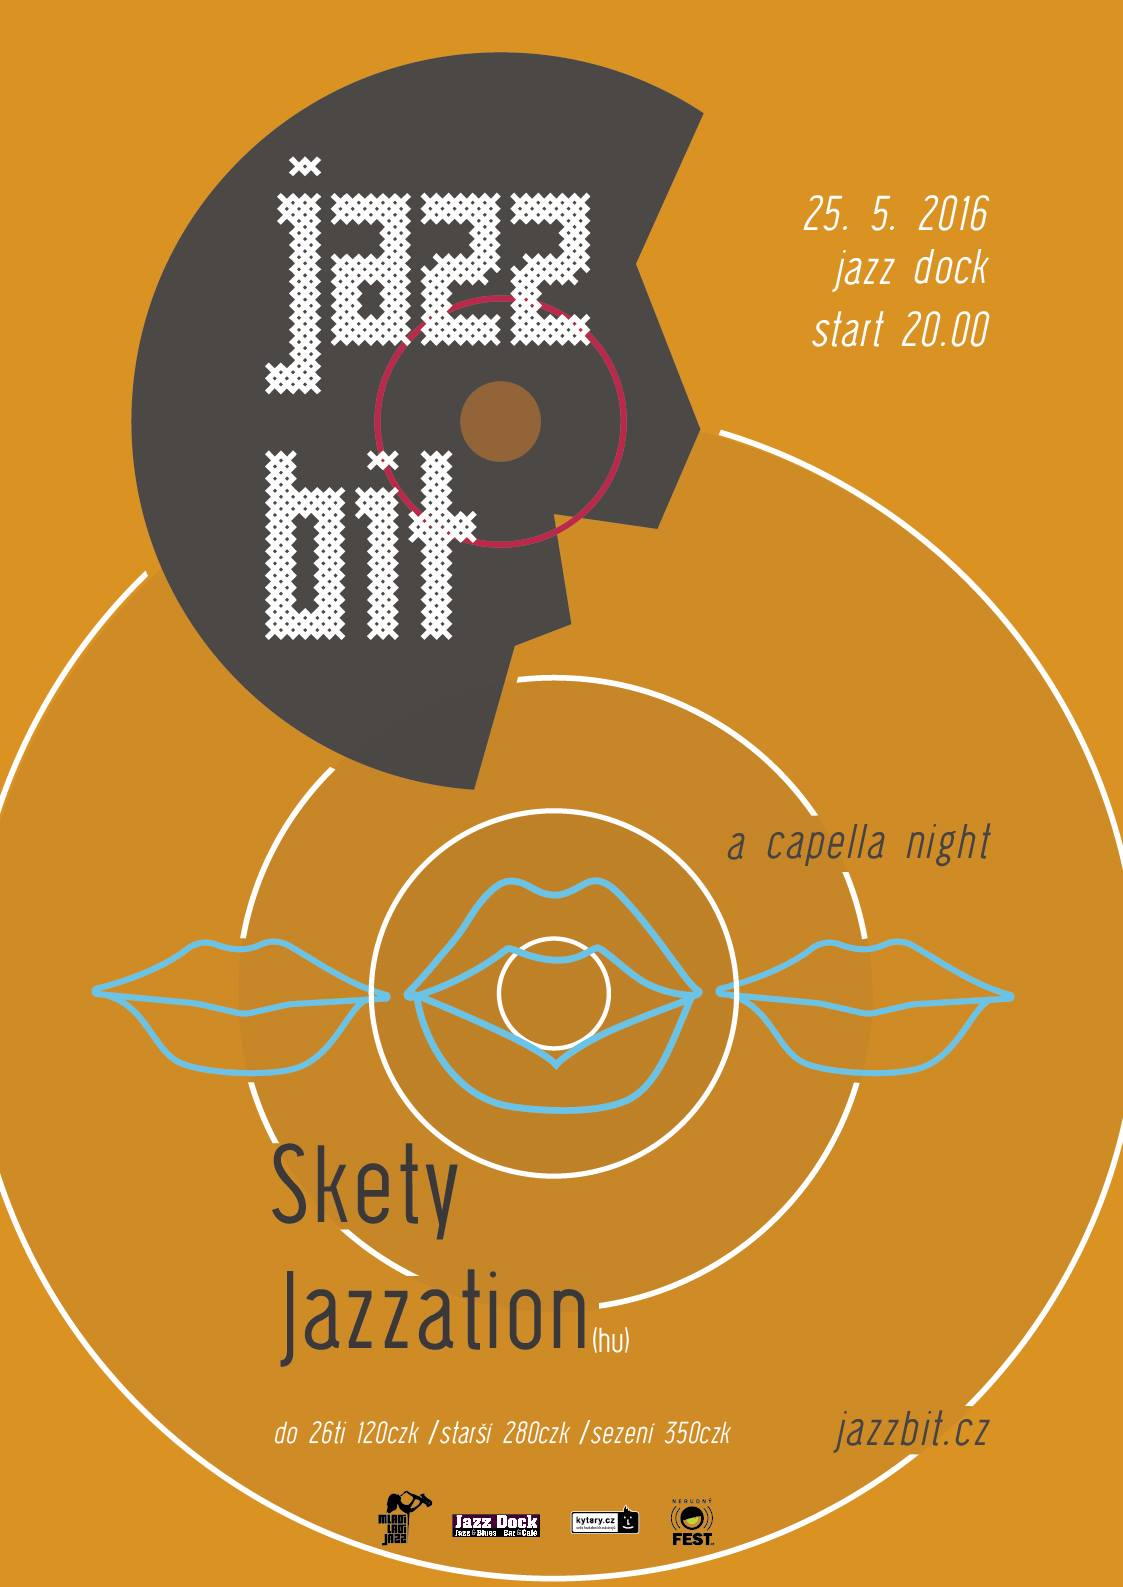 Jazzbit – Jazzation /HU/ + Skety /CZ/ – A Cappella night